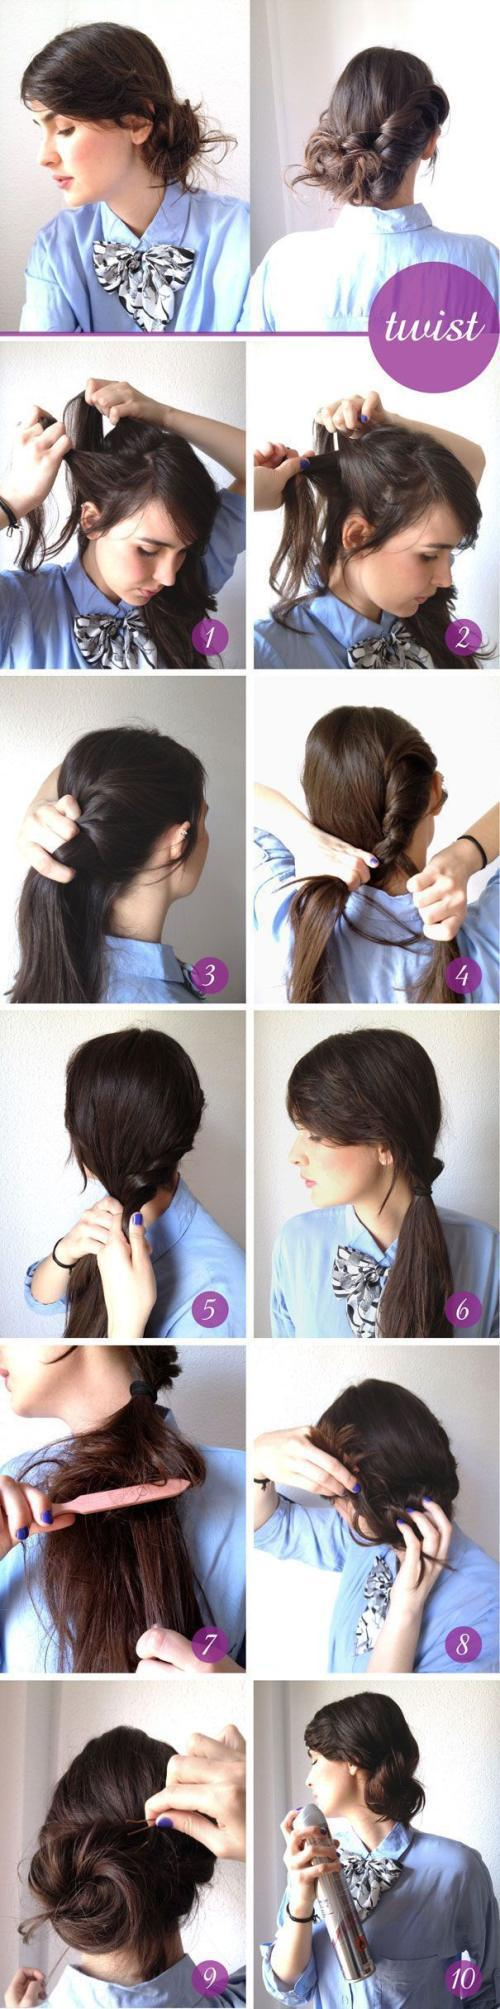 Hair styles do it yourself hairstyles photos hair